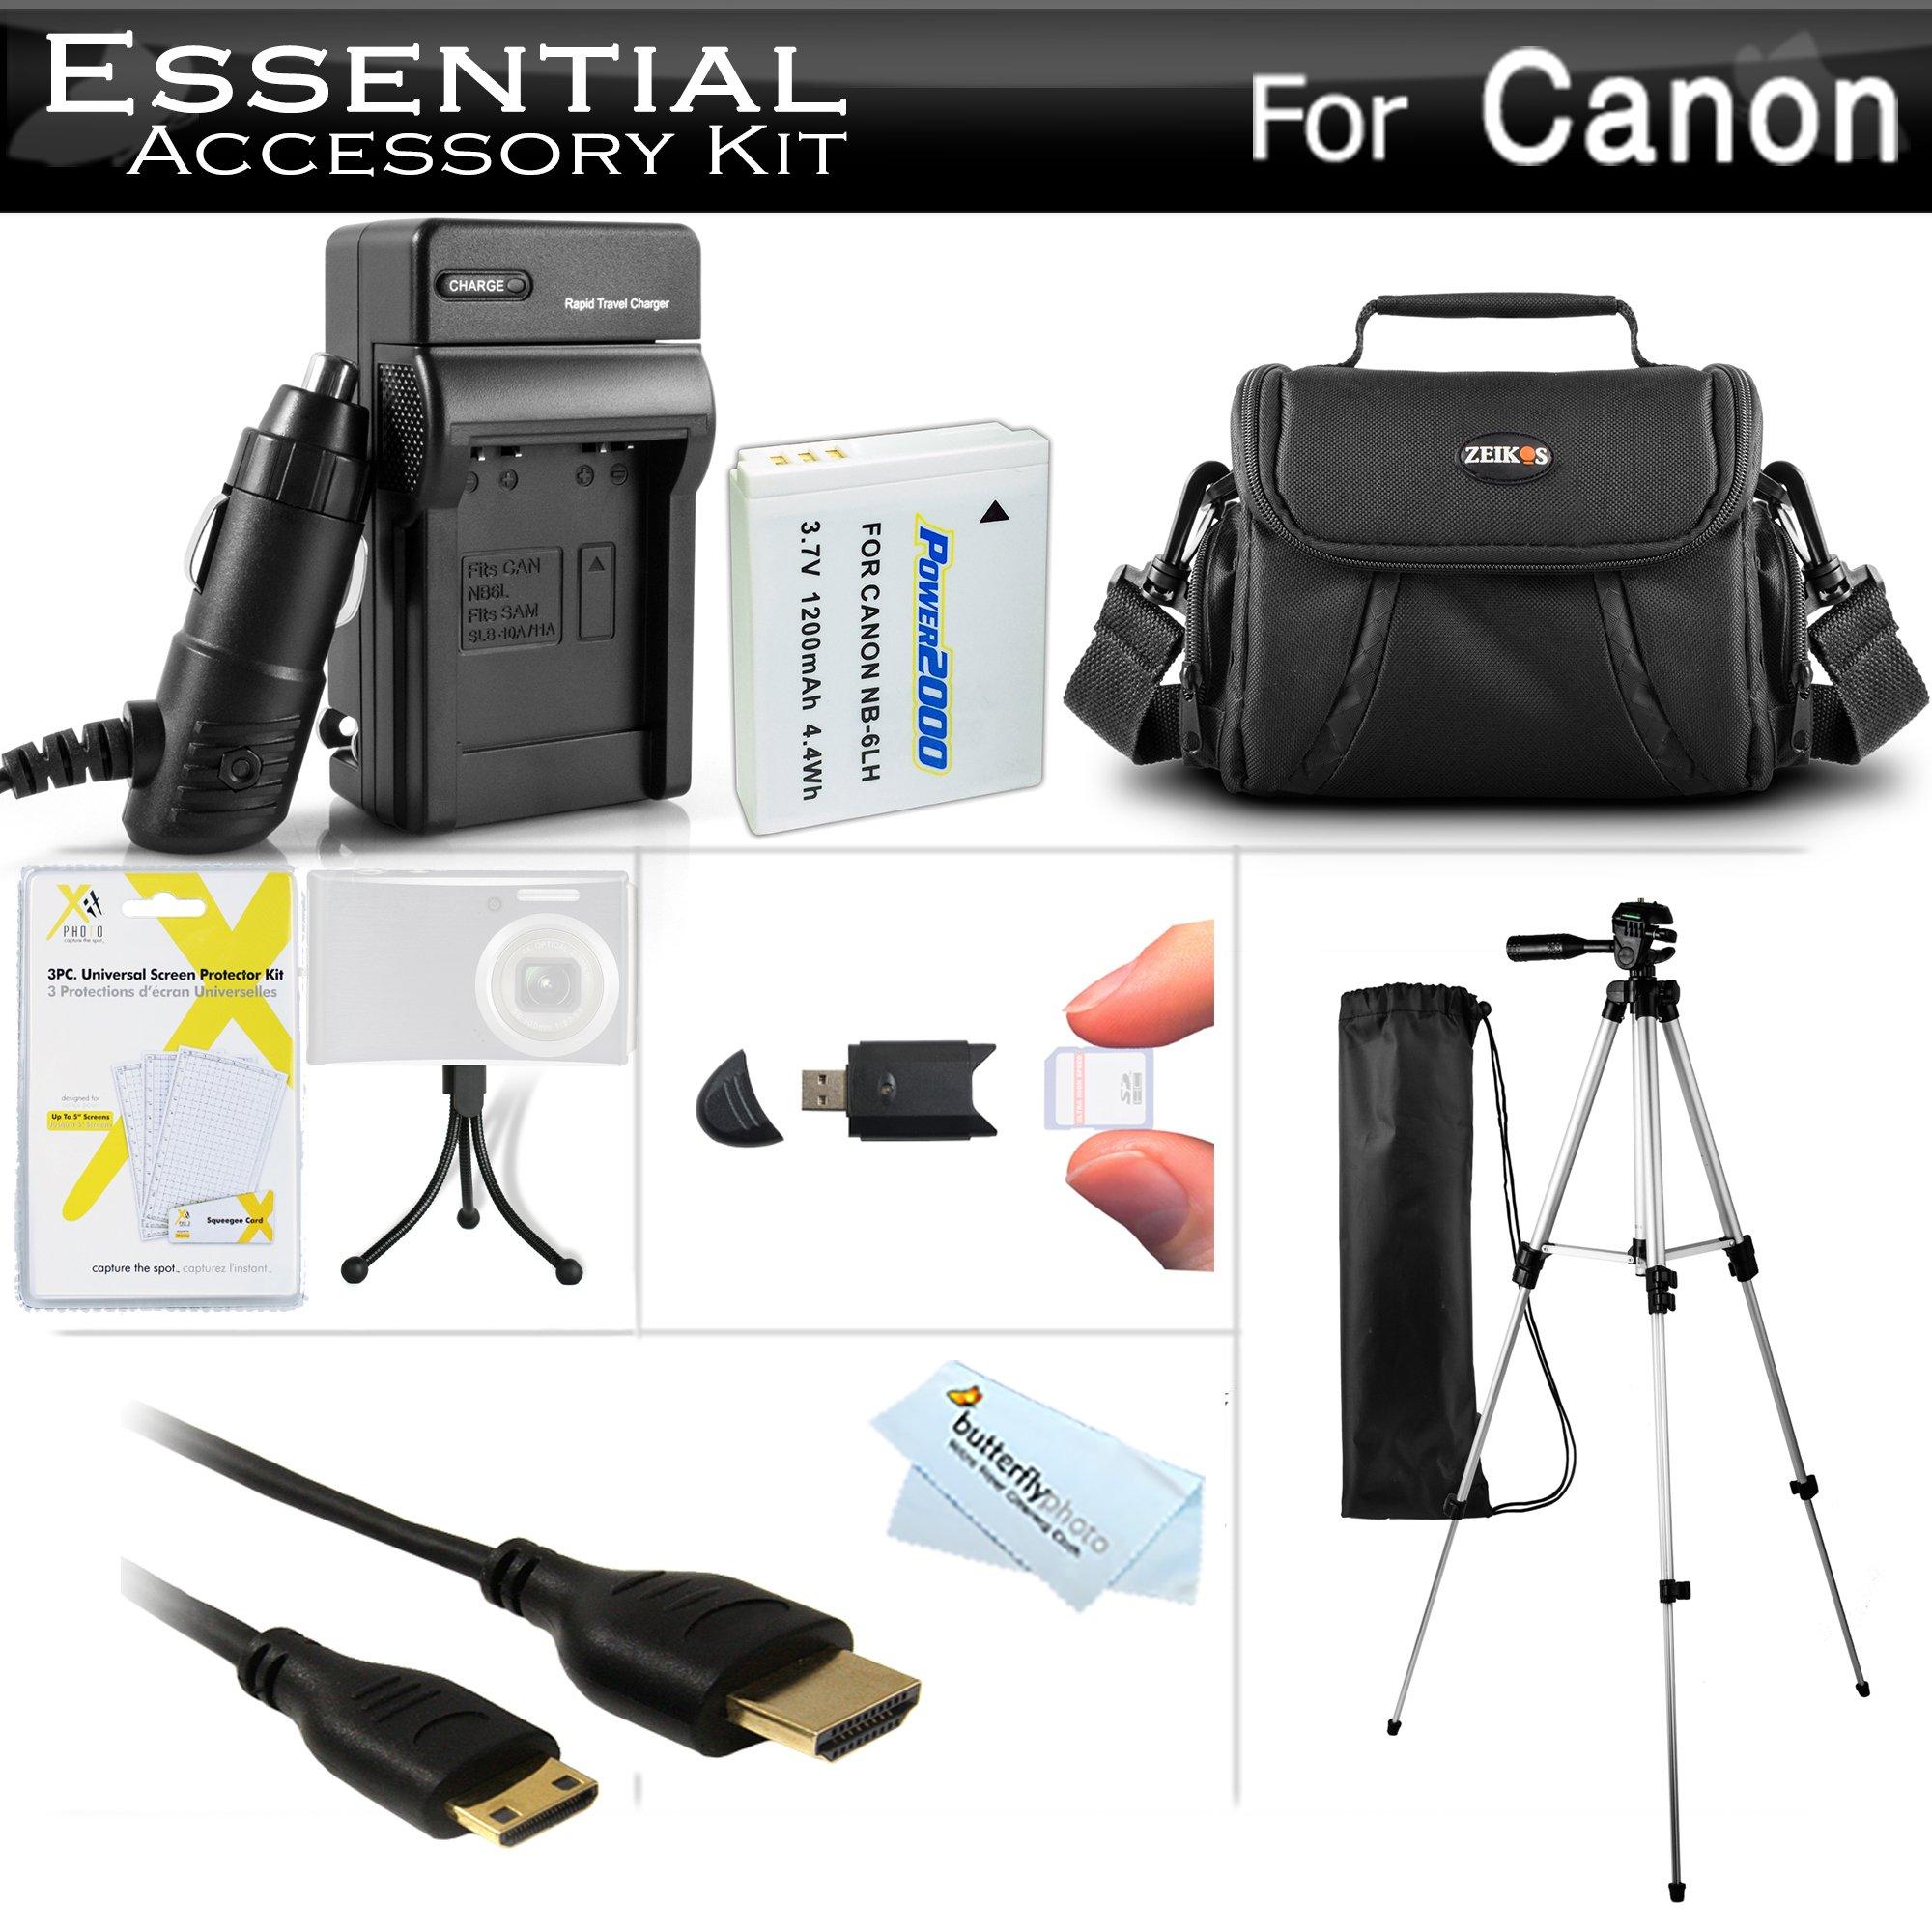 Essential Accessories Kit For Canon PowerShot SX500 IS, SX510 HS, SX520 HS, SX530 HS, SX540 HS Digital Camera Includes Replacement NB-6L Battery + A/Dc Charger + Mini HDMI Cable + Case + Tripod + More